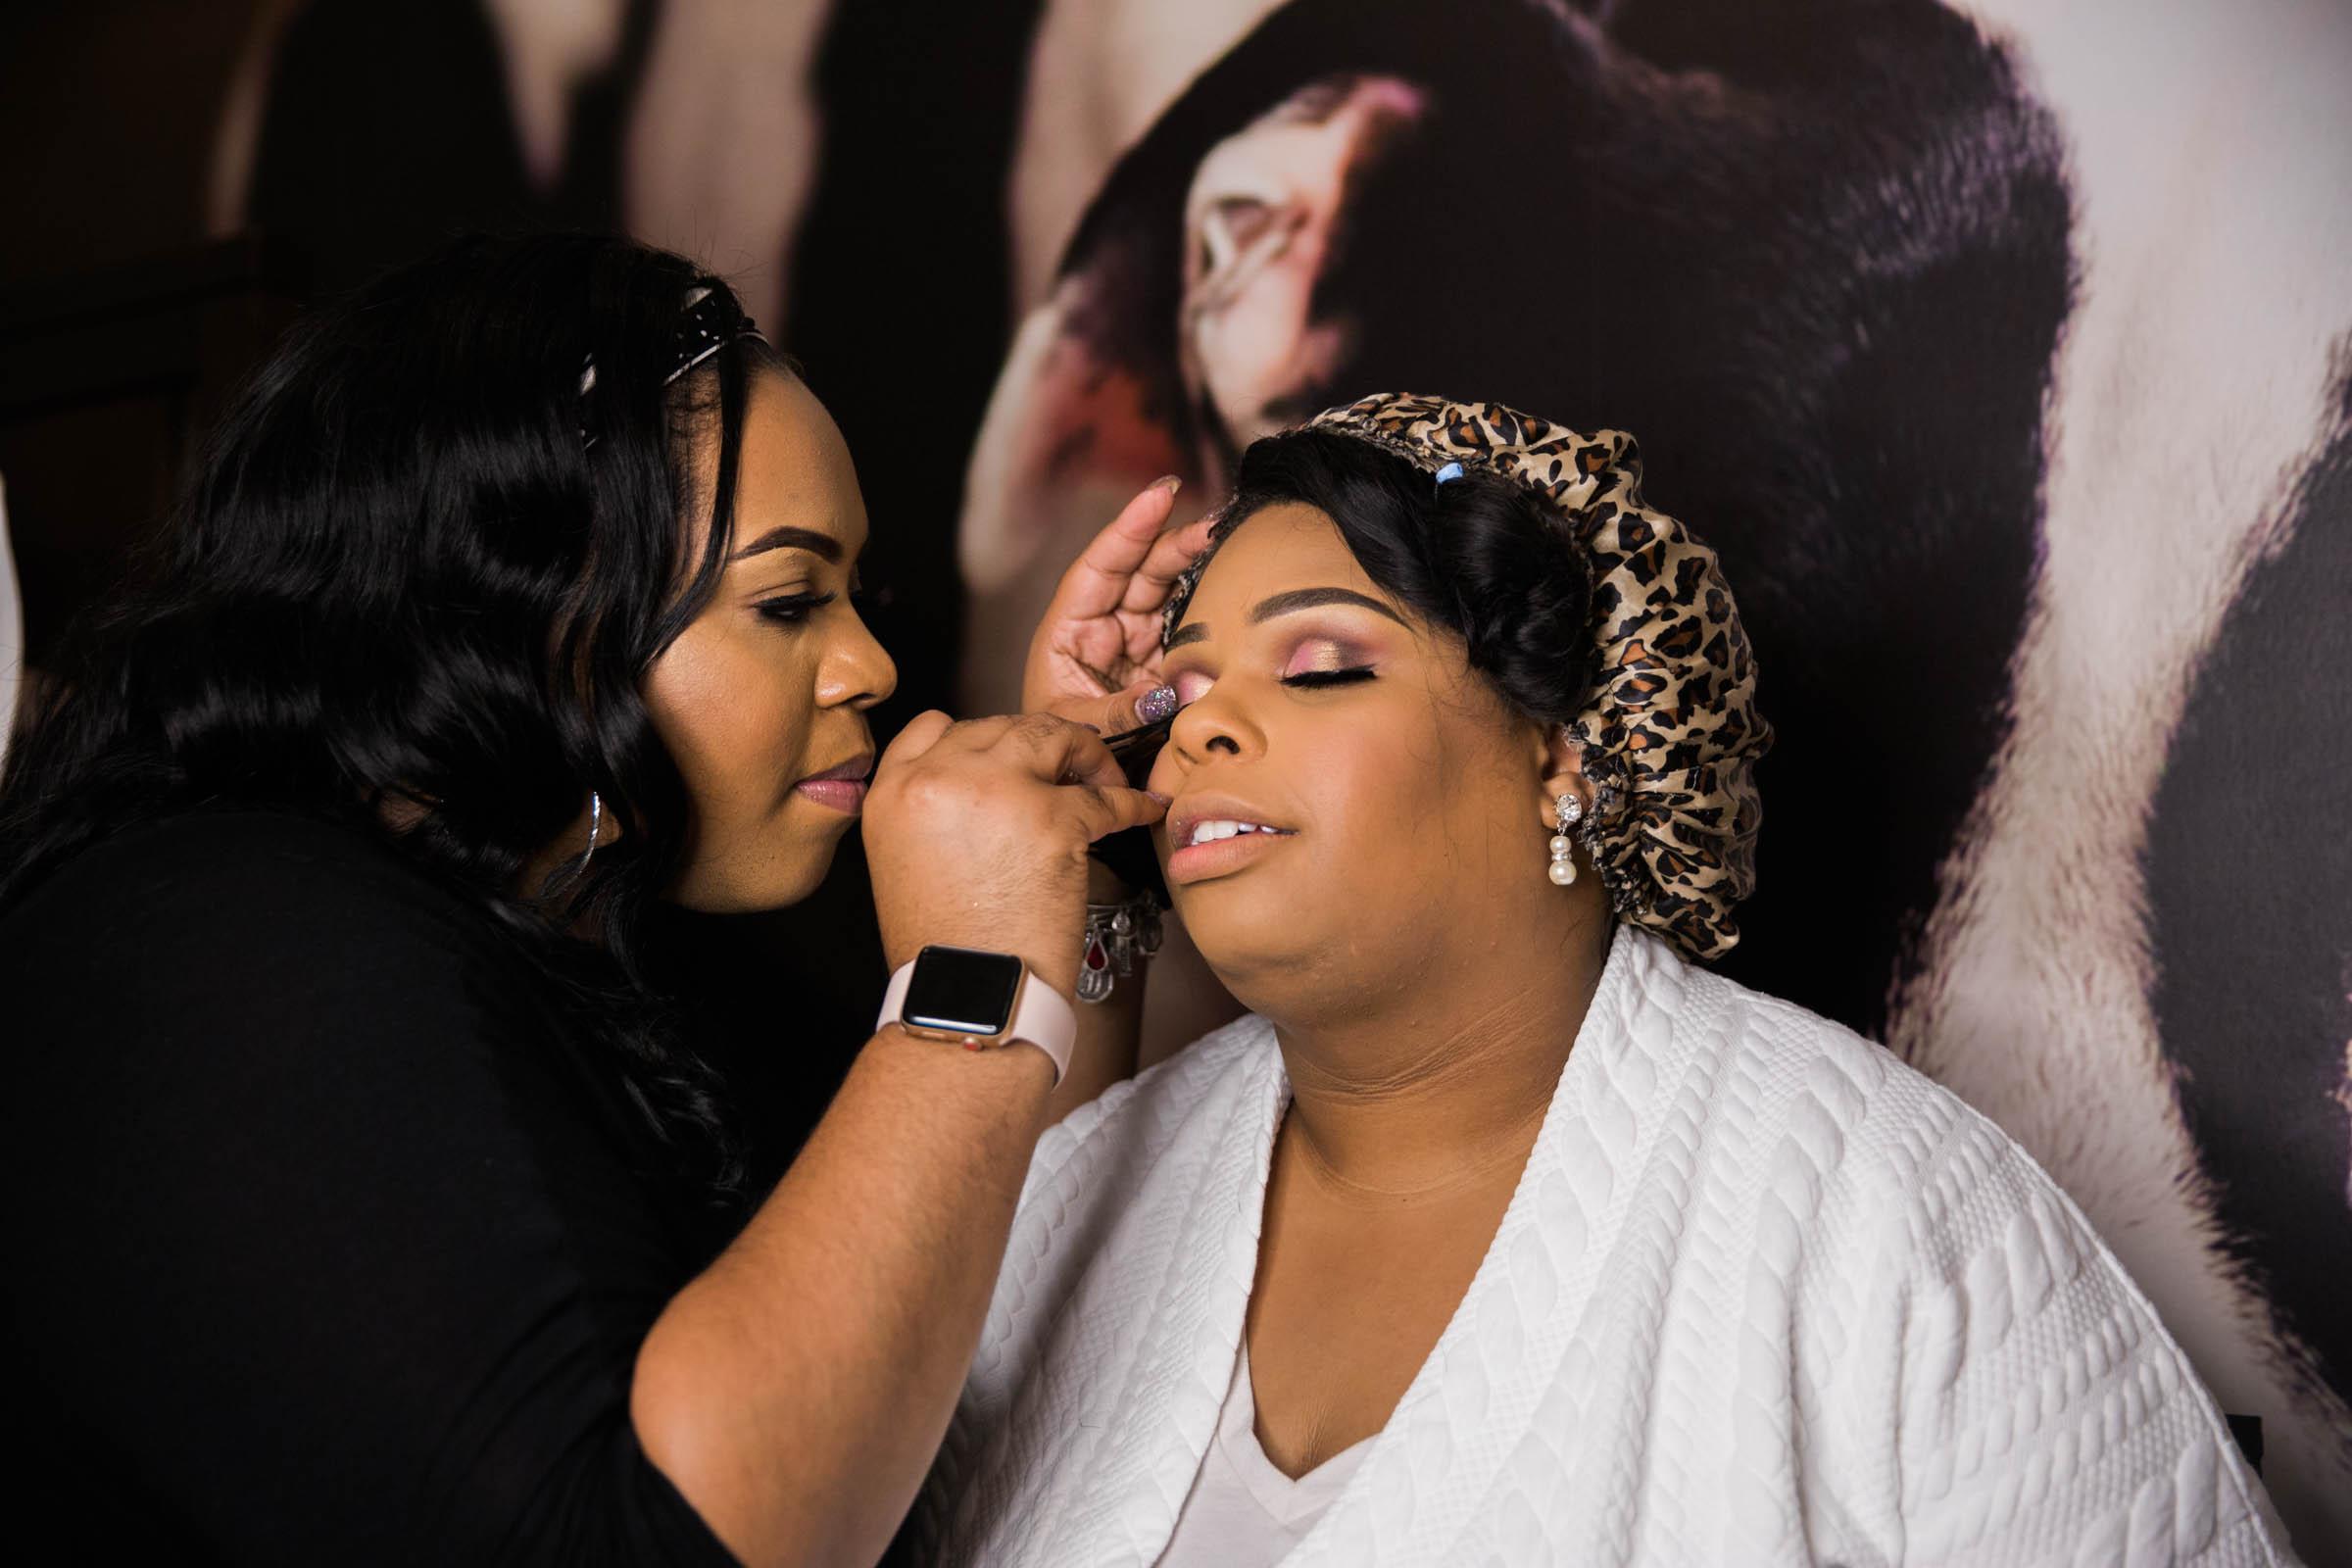 Royal Black Bride in Baltimore Preston Hall Black Wedding Photographers Megapixels Media Photography (7 of 73).jpg